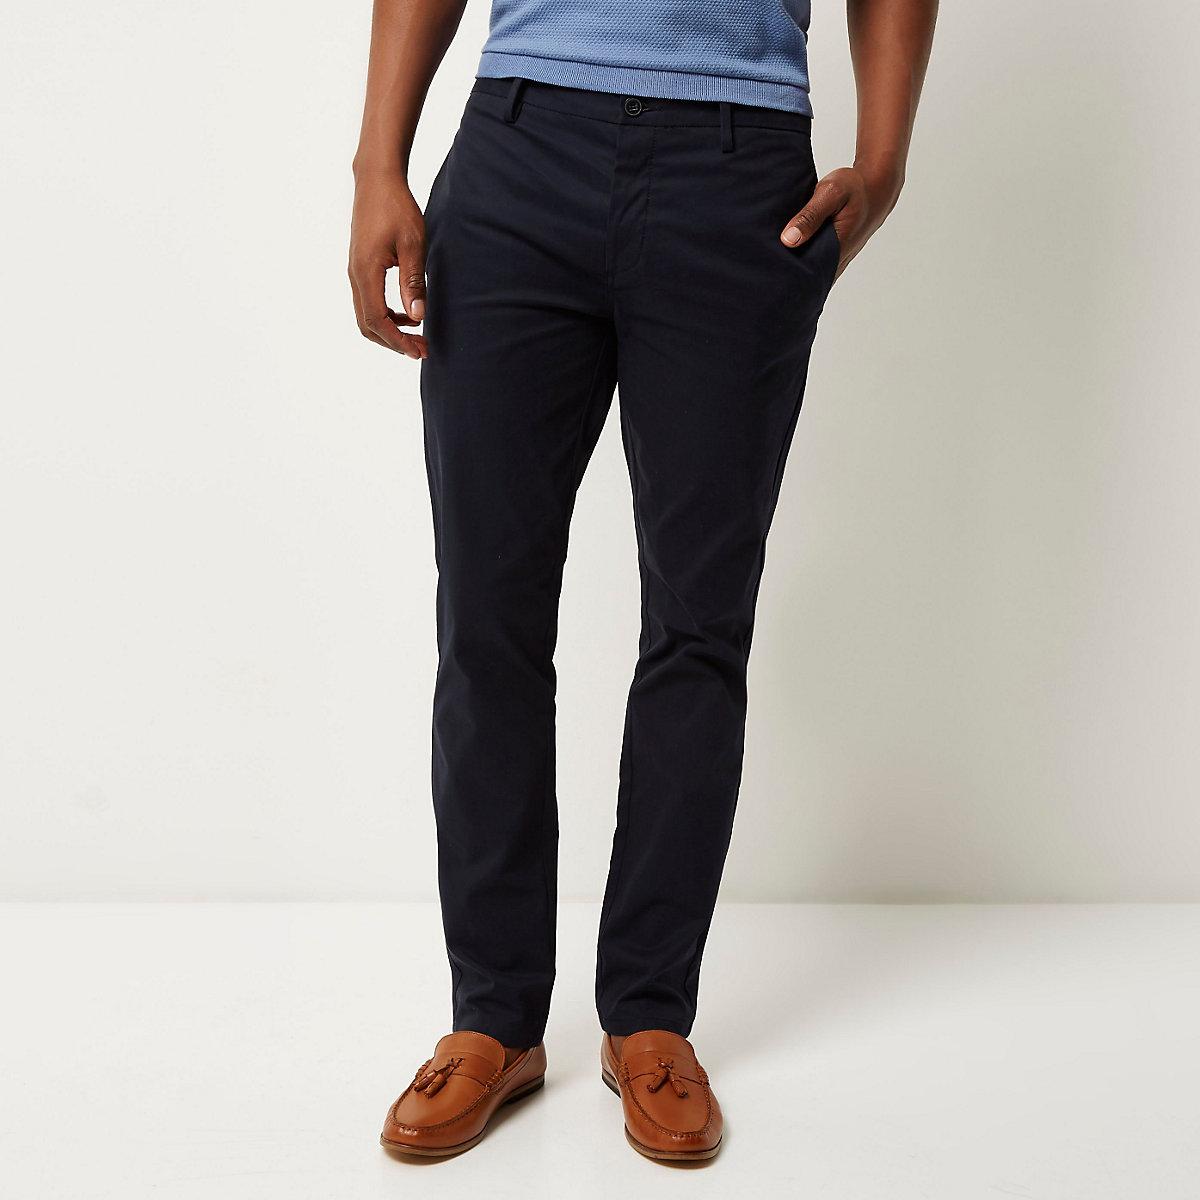 Navy stretch slim fit chino pants